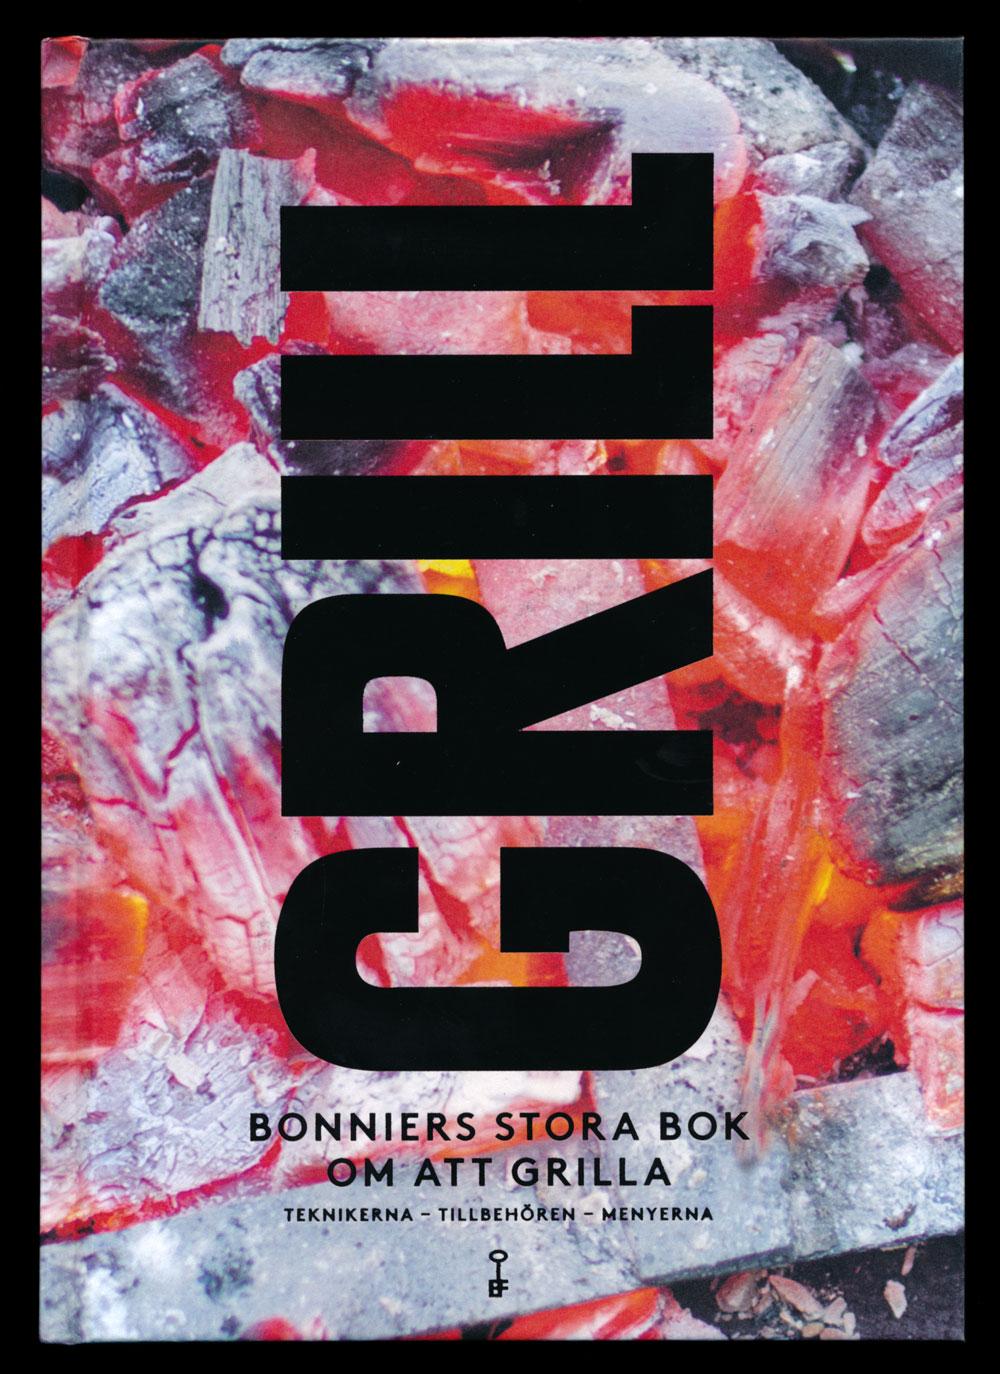 bonniers stora bok om att grilla